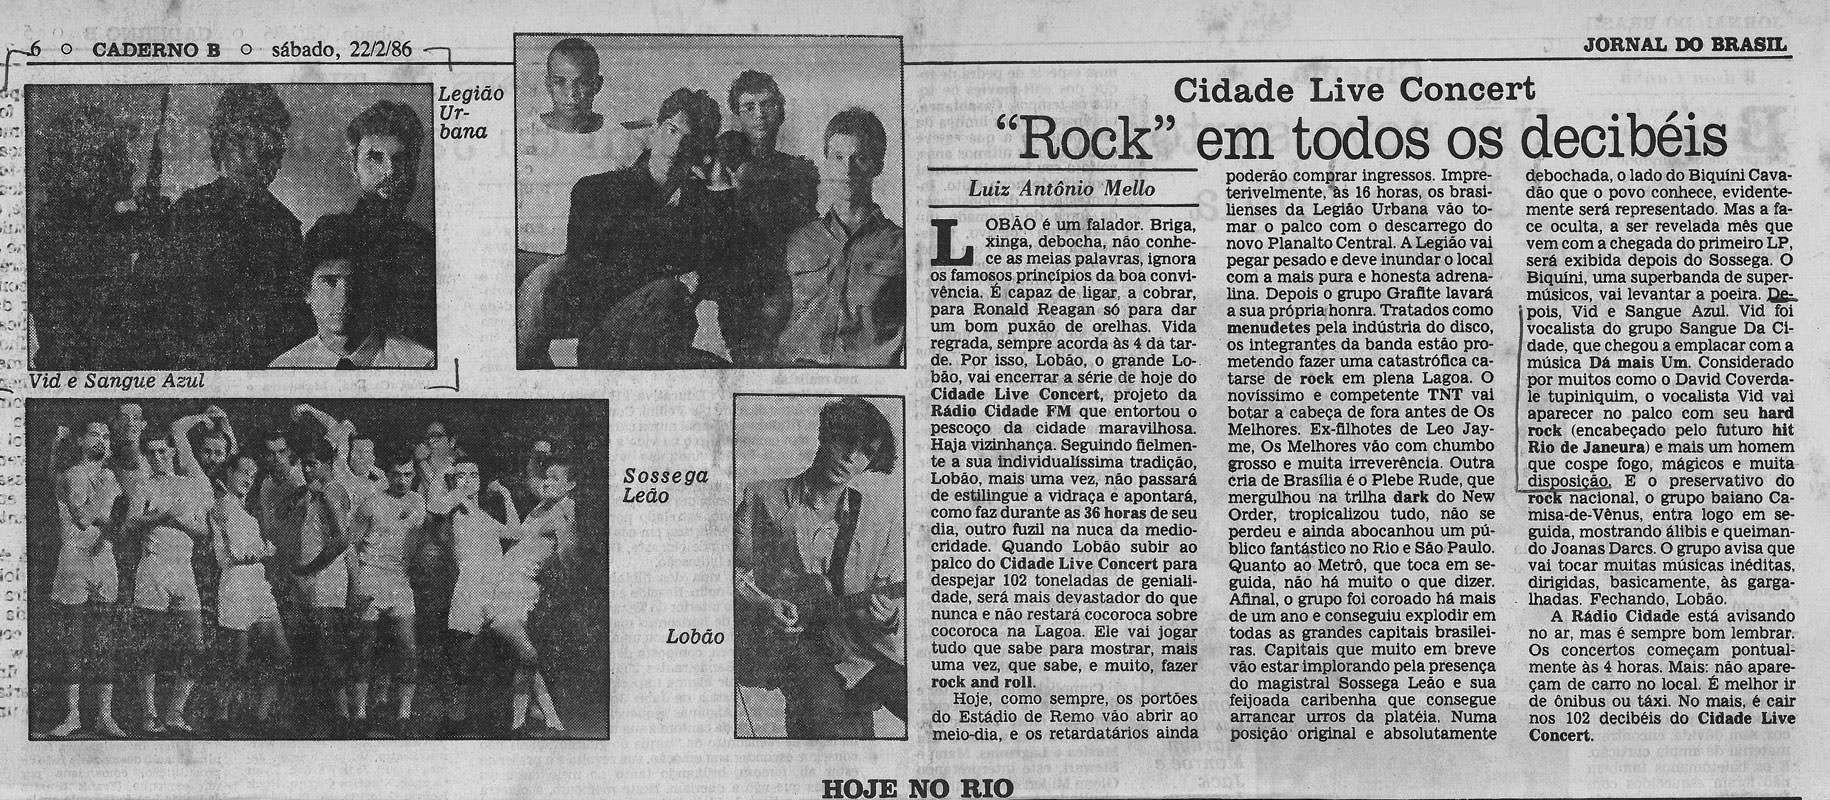 jornal-do-brasil-rio-de-janeura